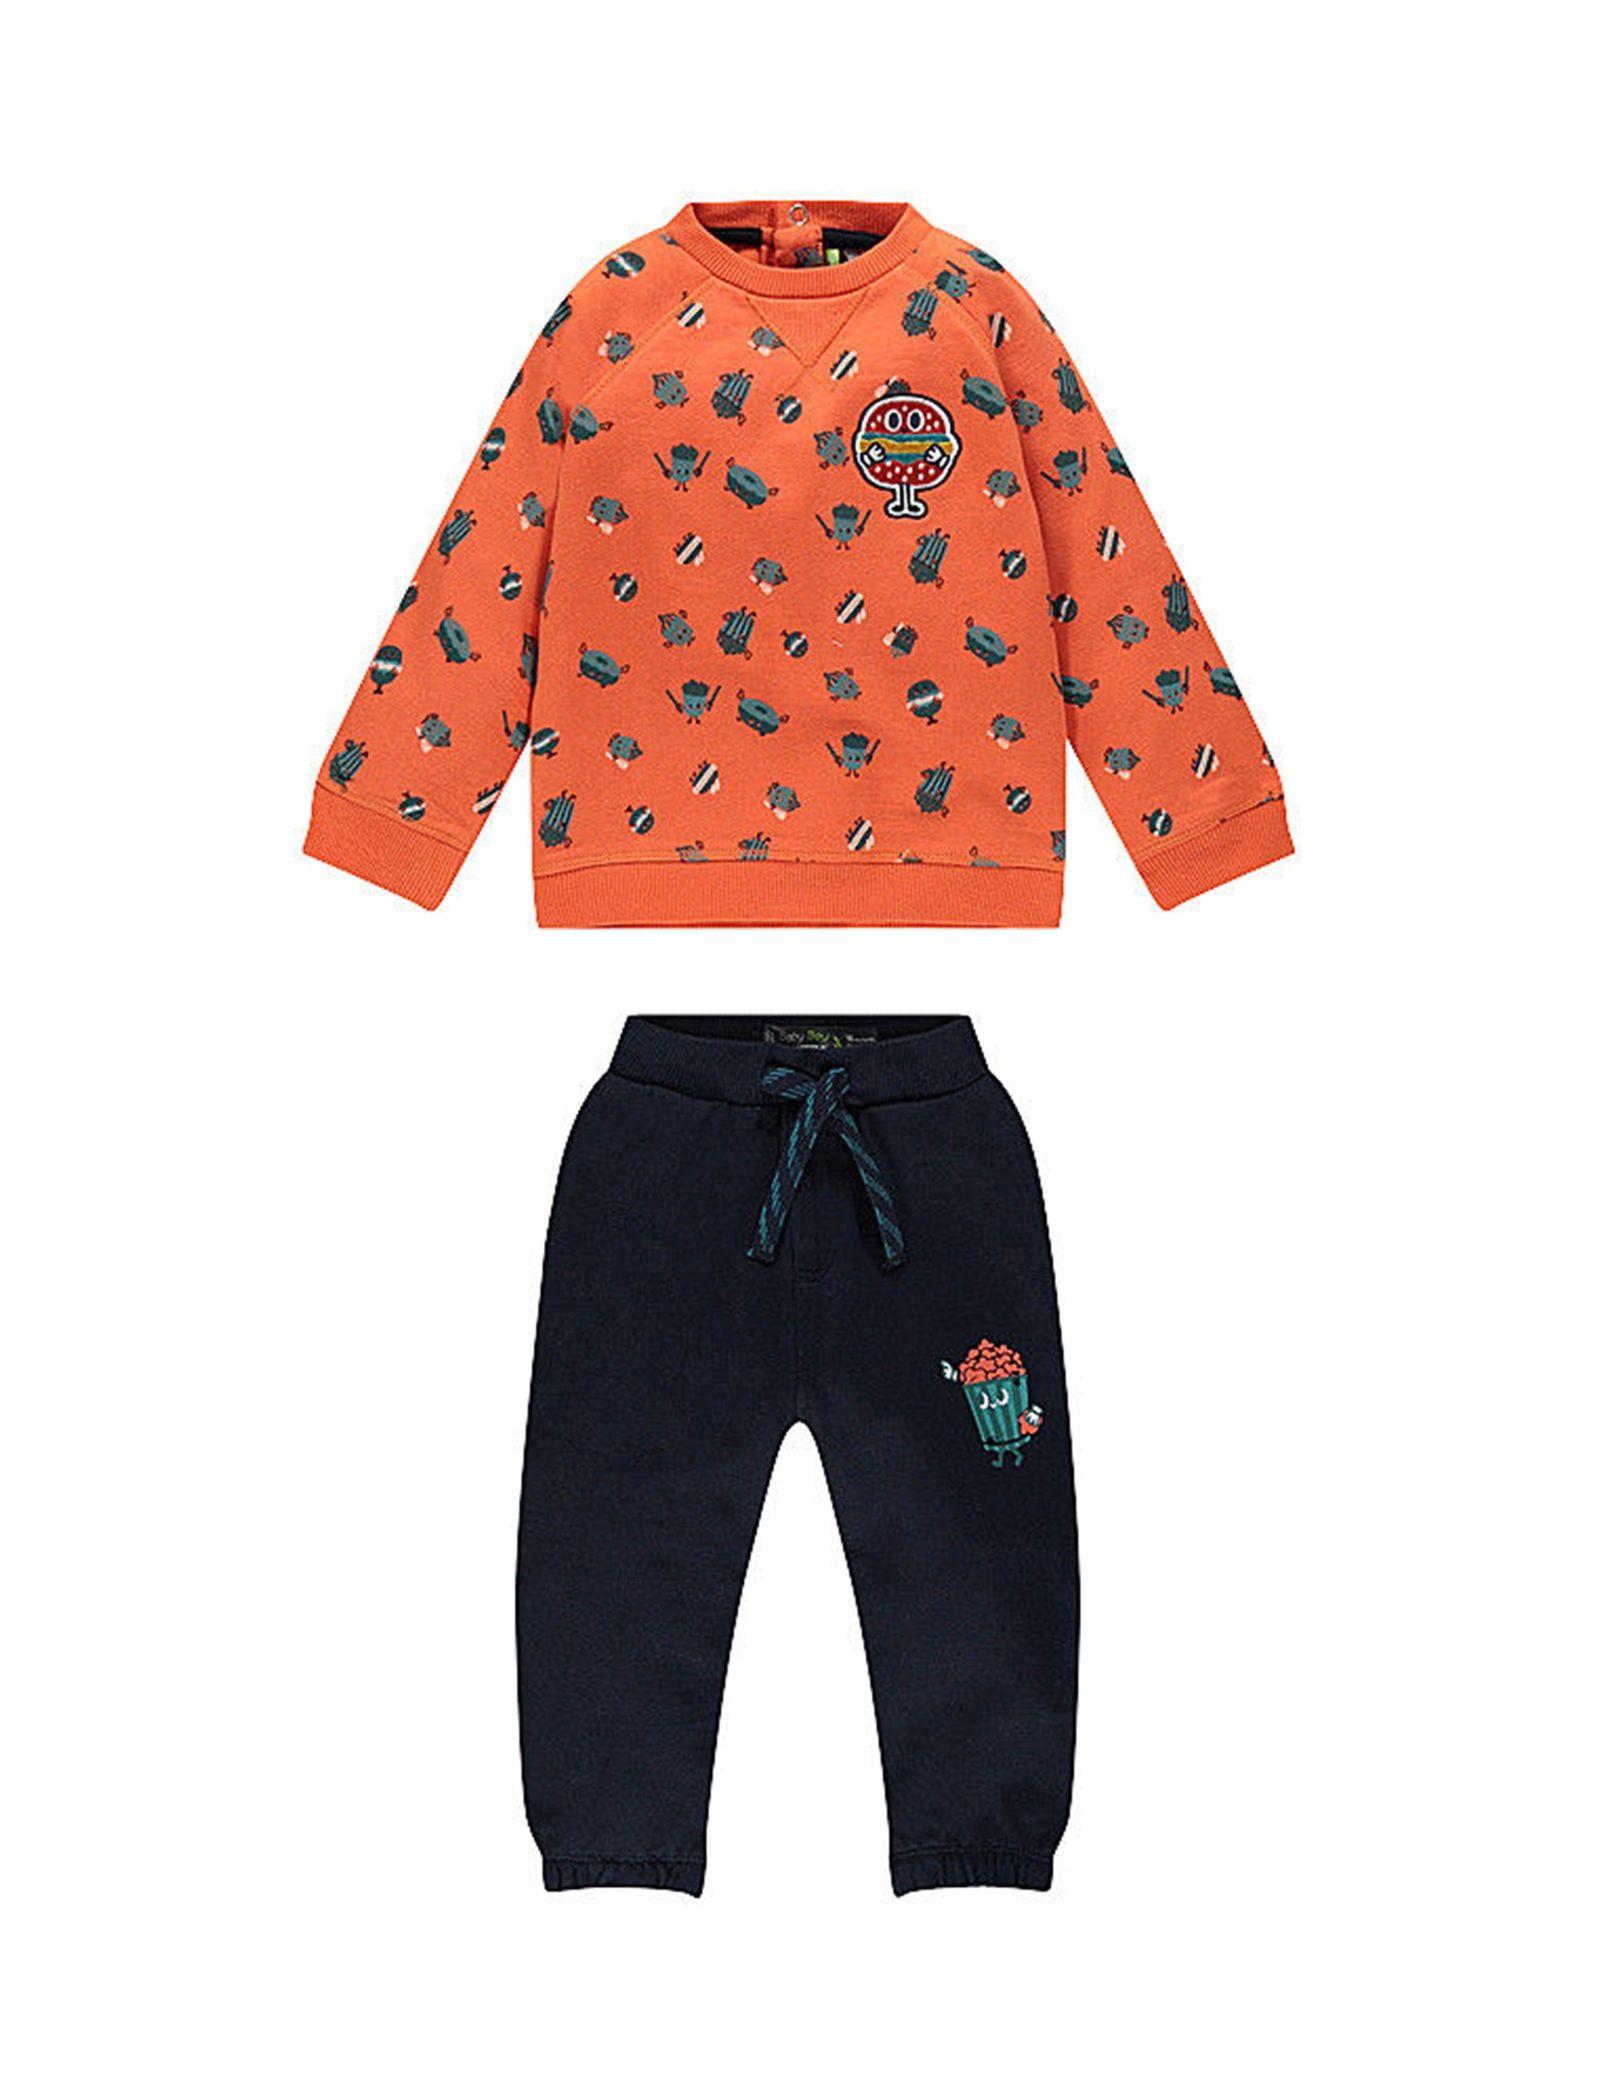 سویشرت و شلوار نخی دم پا کش نوزادی پسرانه - ارکسترا - سرمه اي و نارنجي - 1